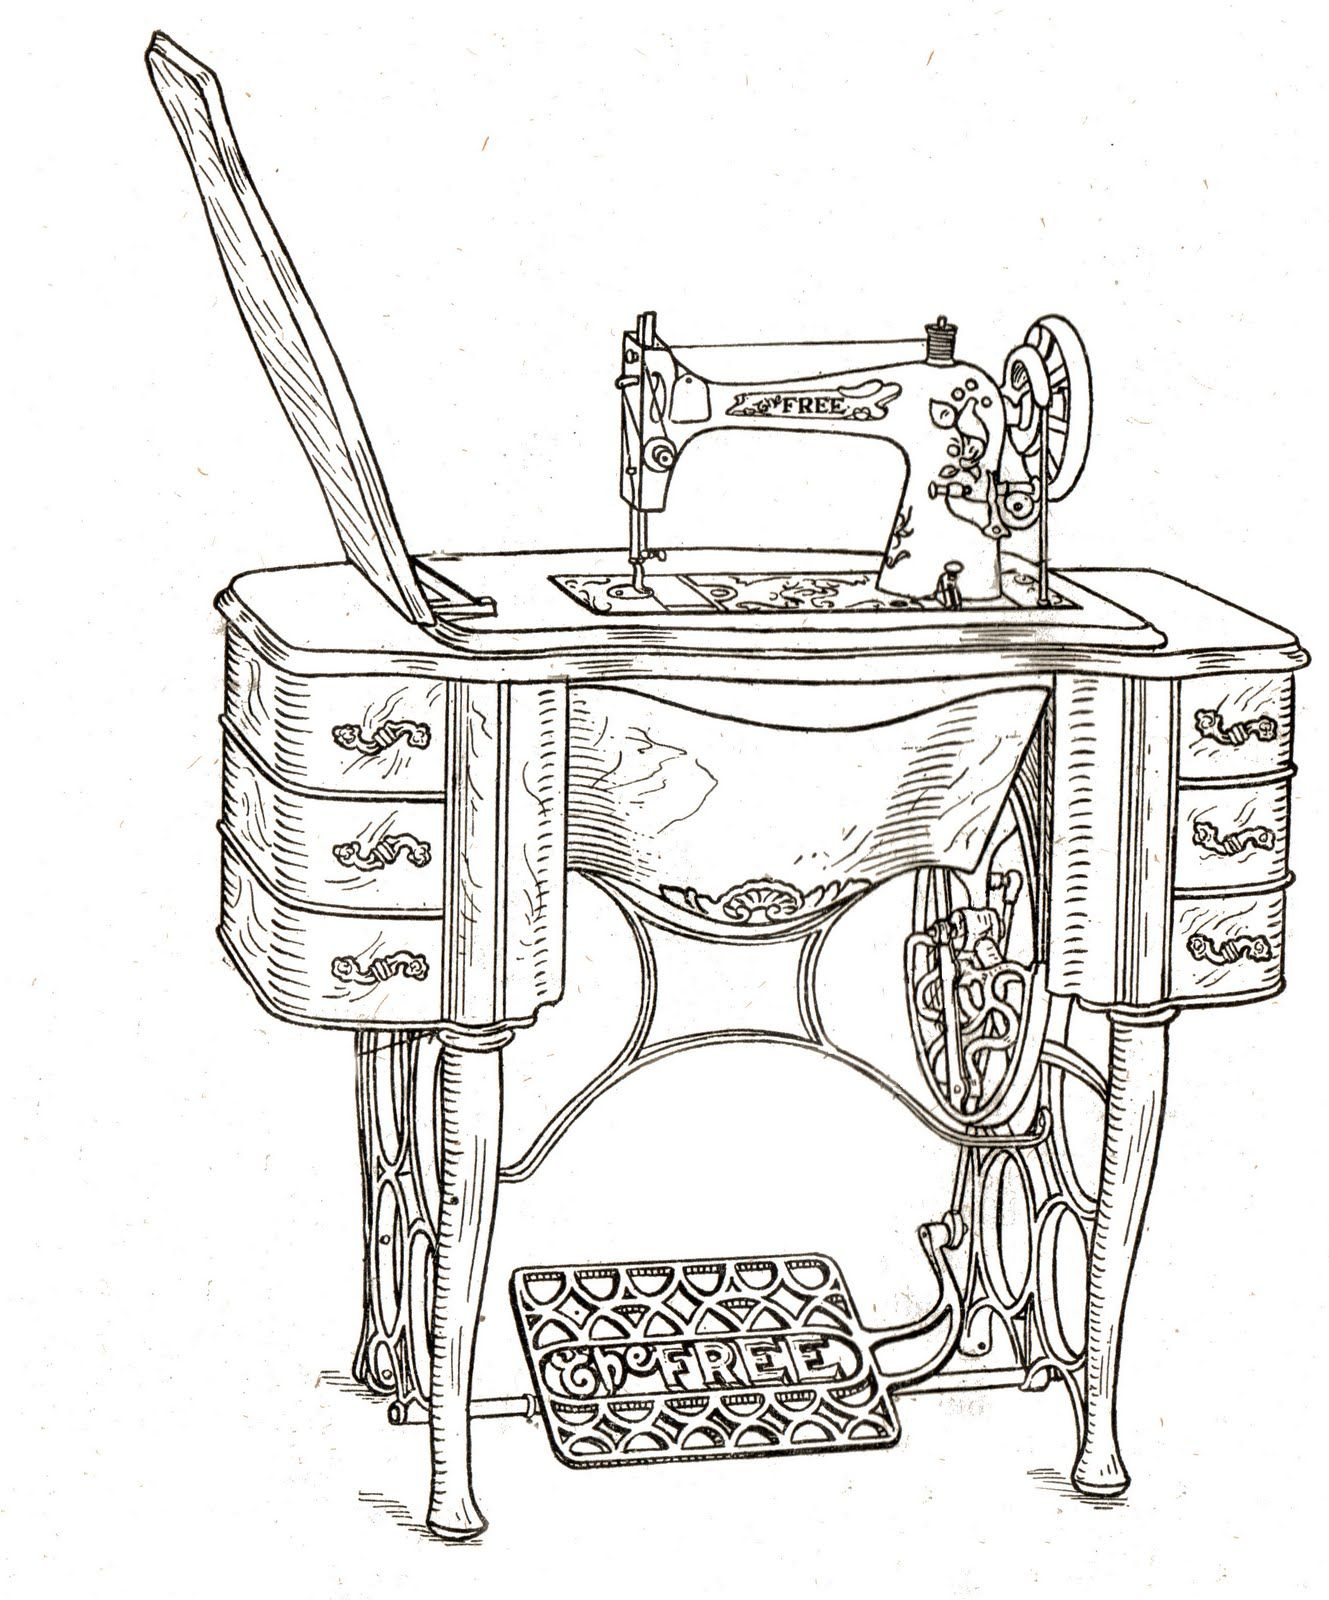 ref. para costureros | transferencia costura